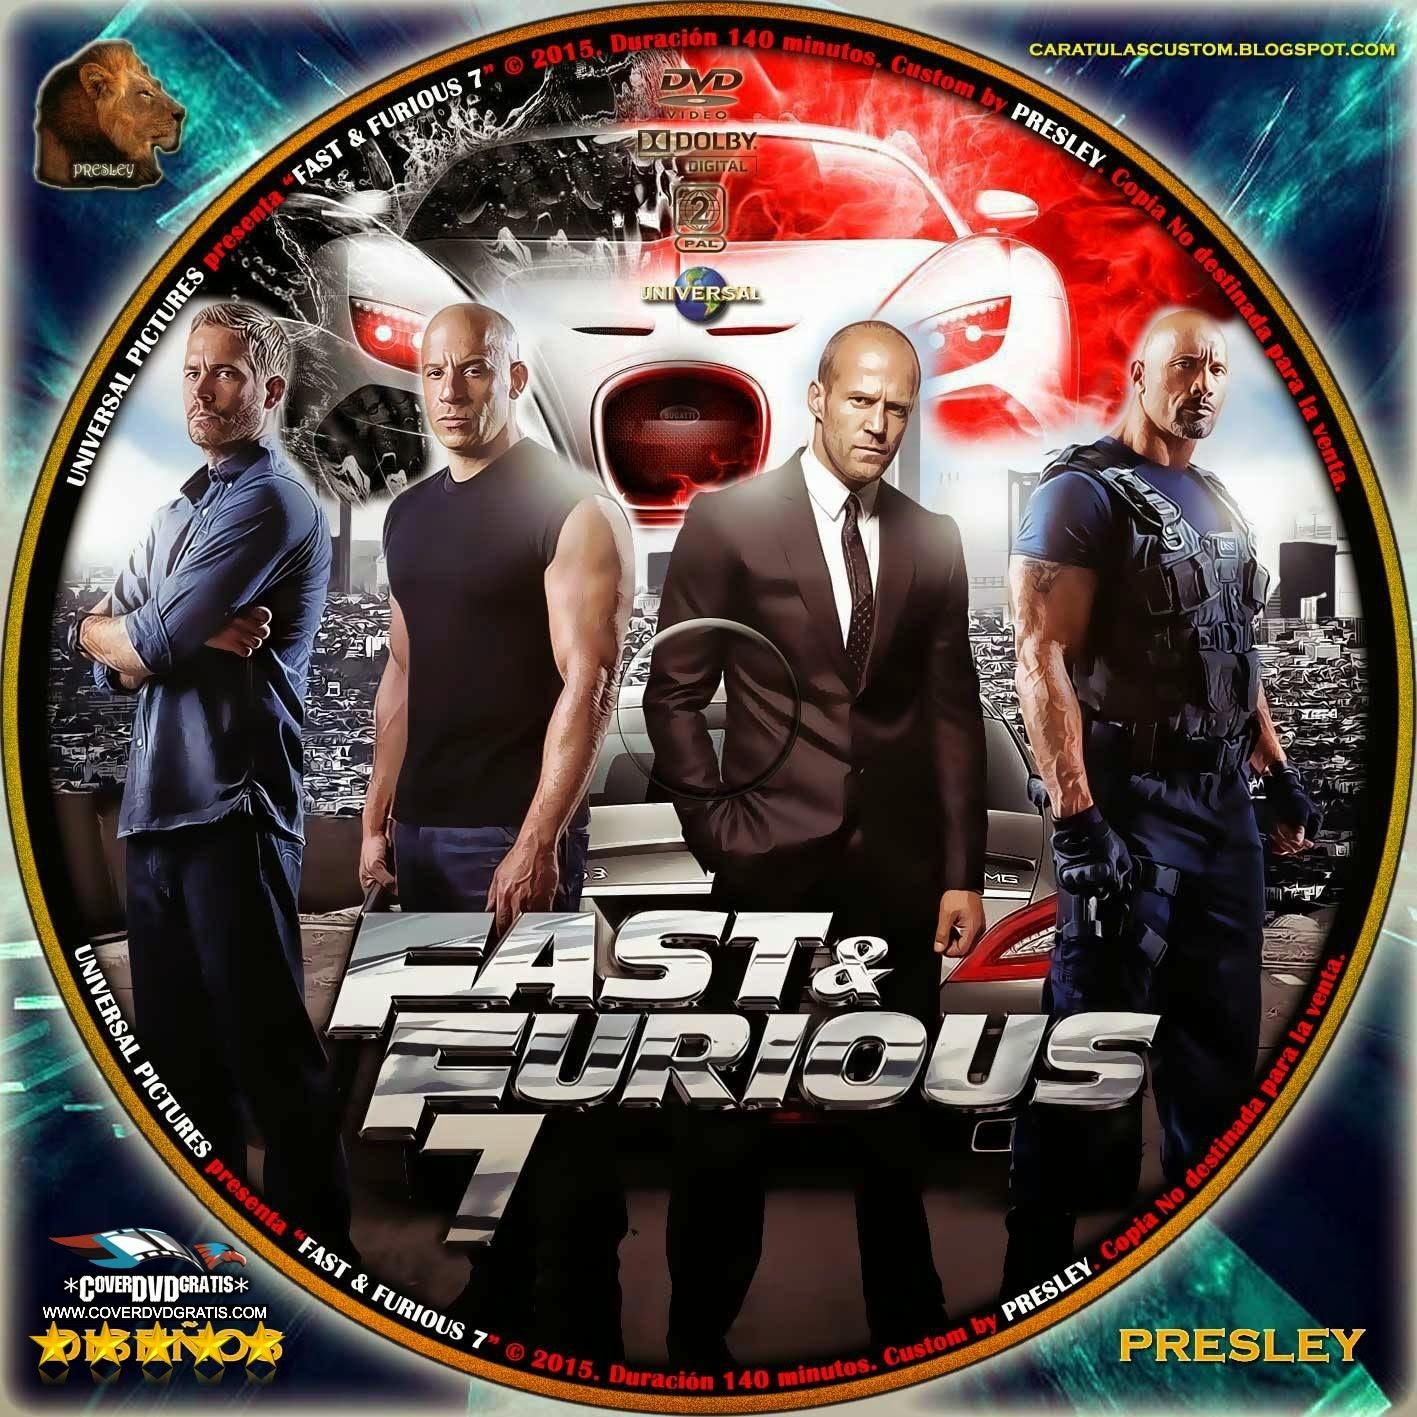 fast furious 7 2015 dvd cover coverdvdgratis. Black Bedroom Furniture Sets. Home Design Ideas